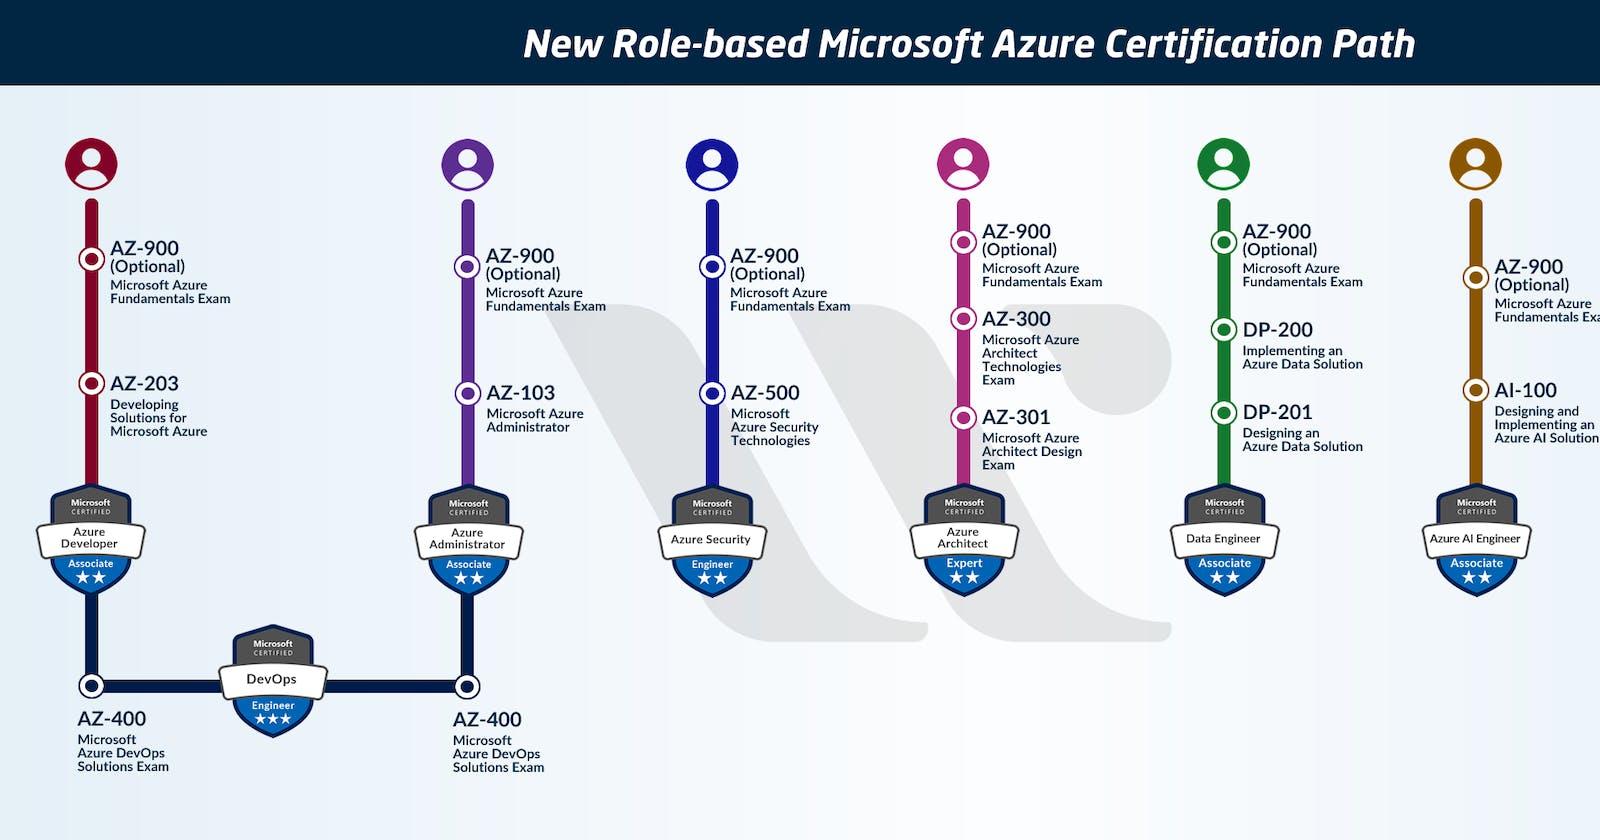 AZ-900: Microsoft Azure Fundamentals Certification